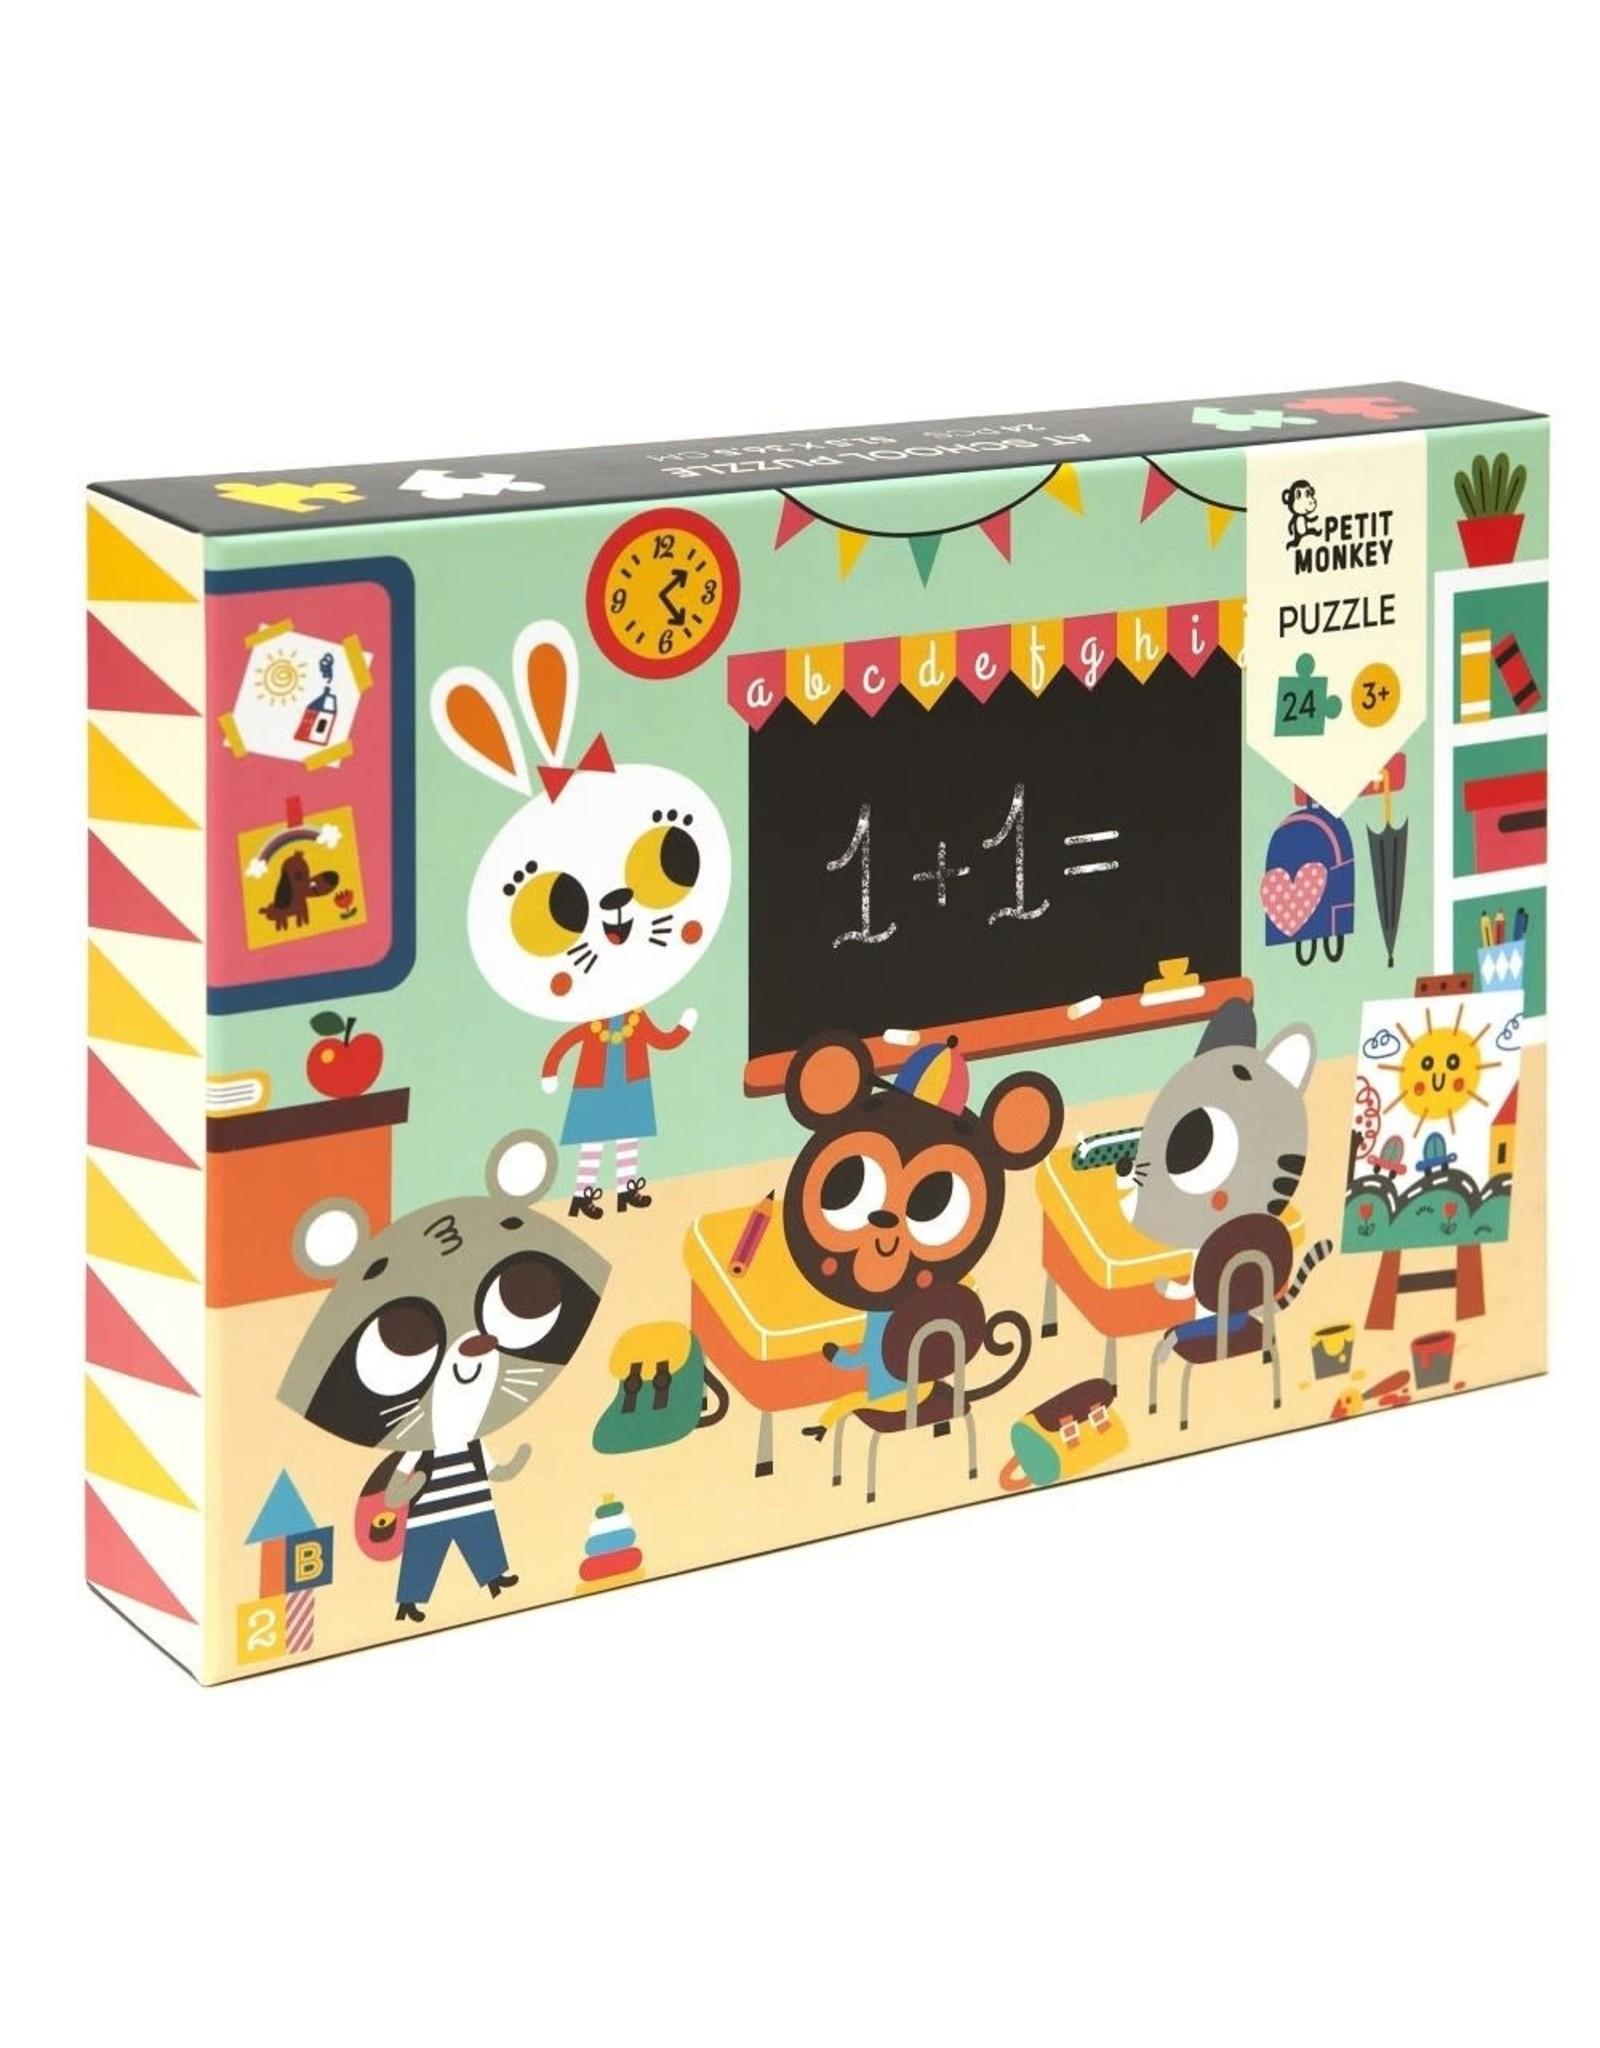 Petit Monkey At school puzzle (24 stukken)